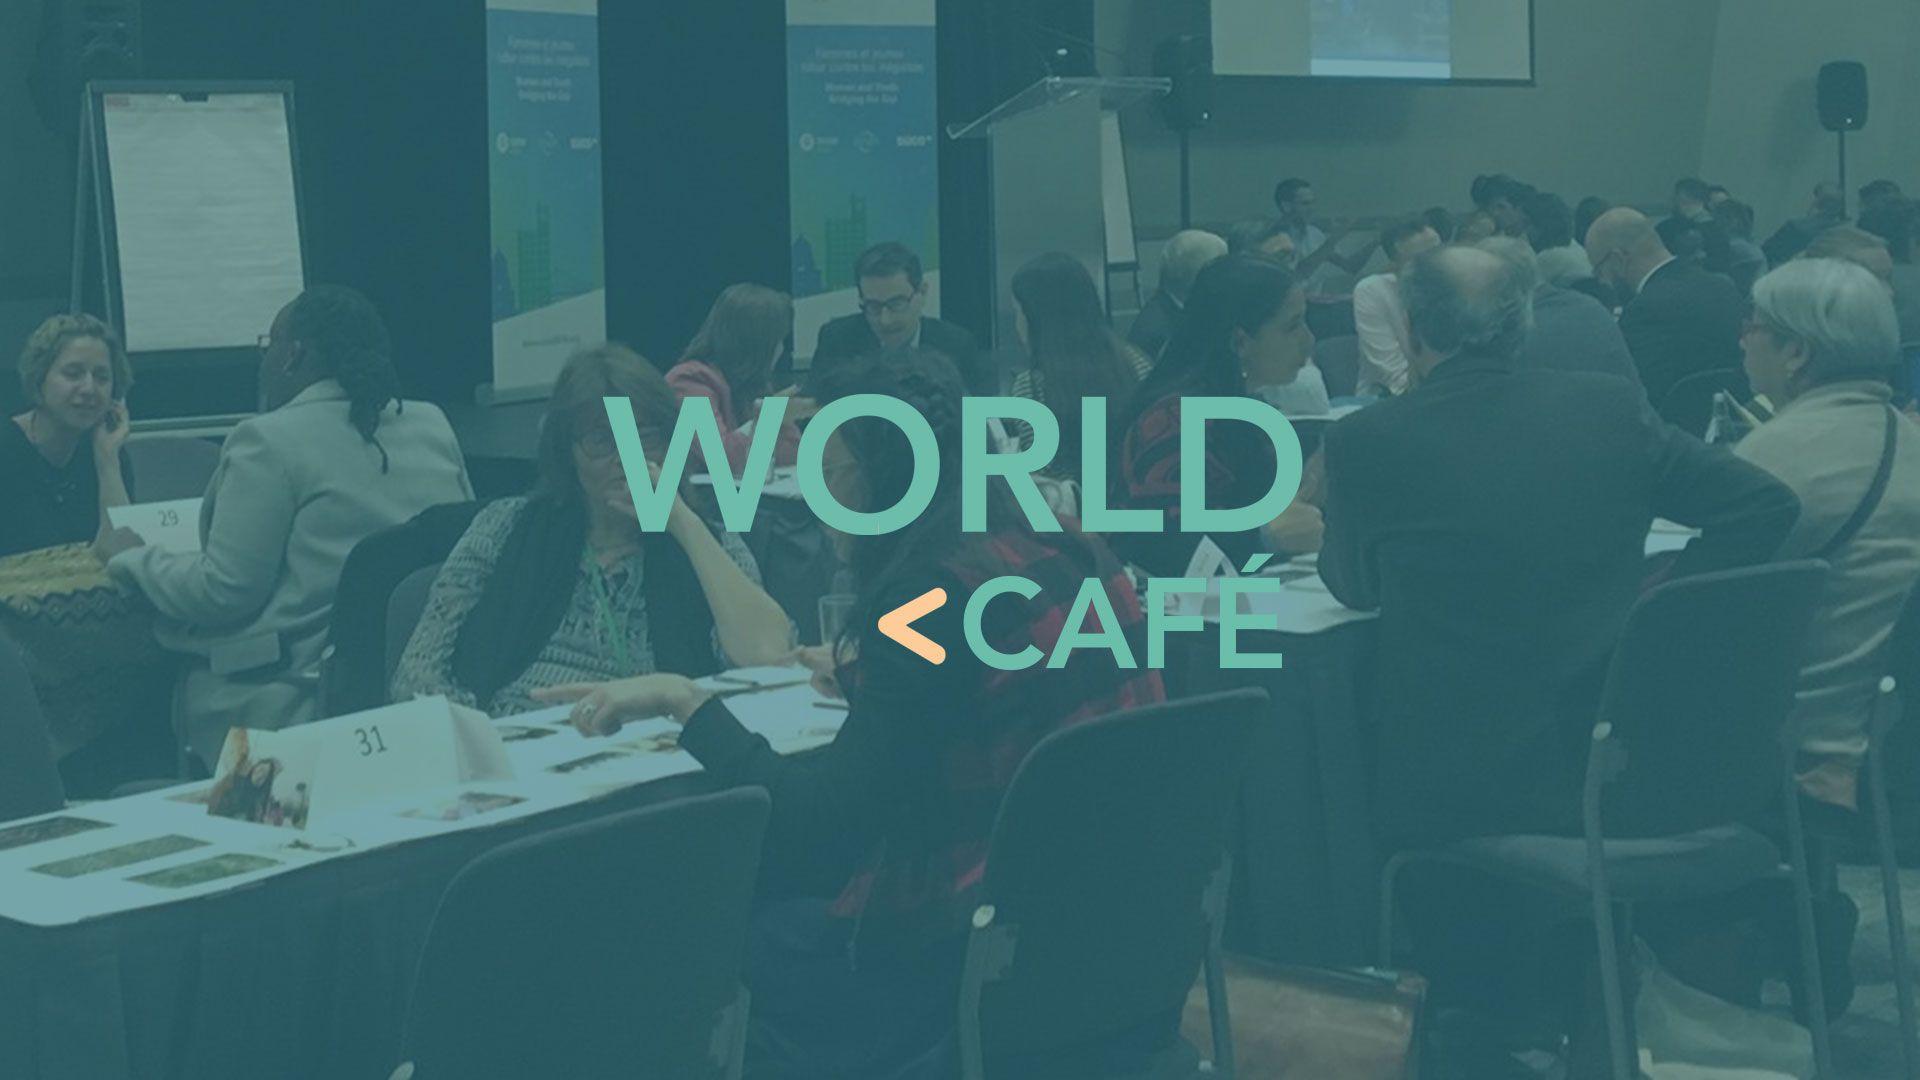 World-cafe.jpg